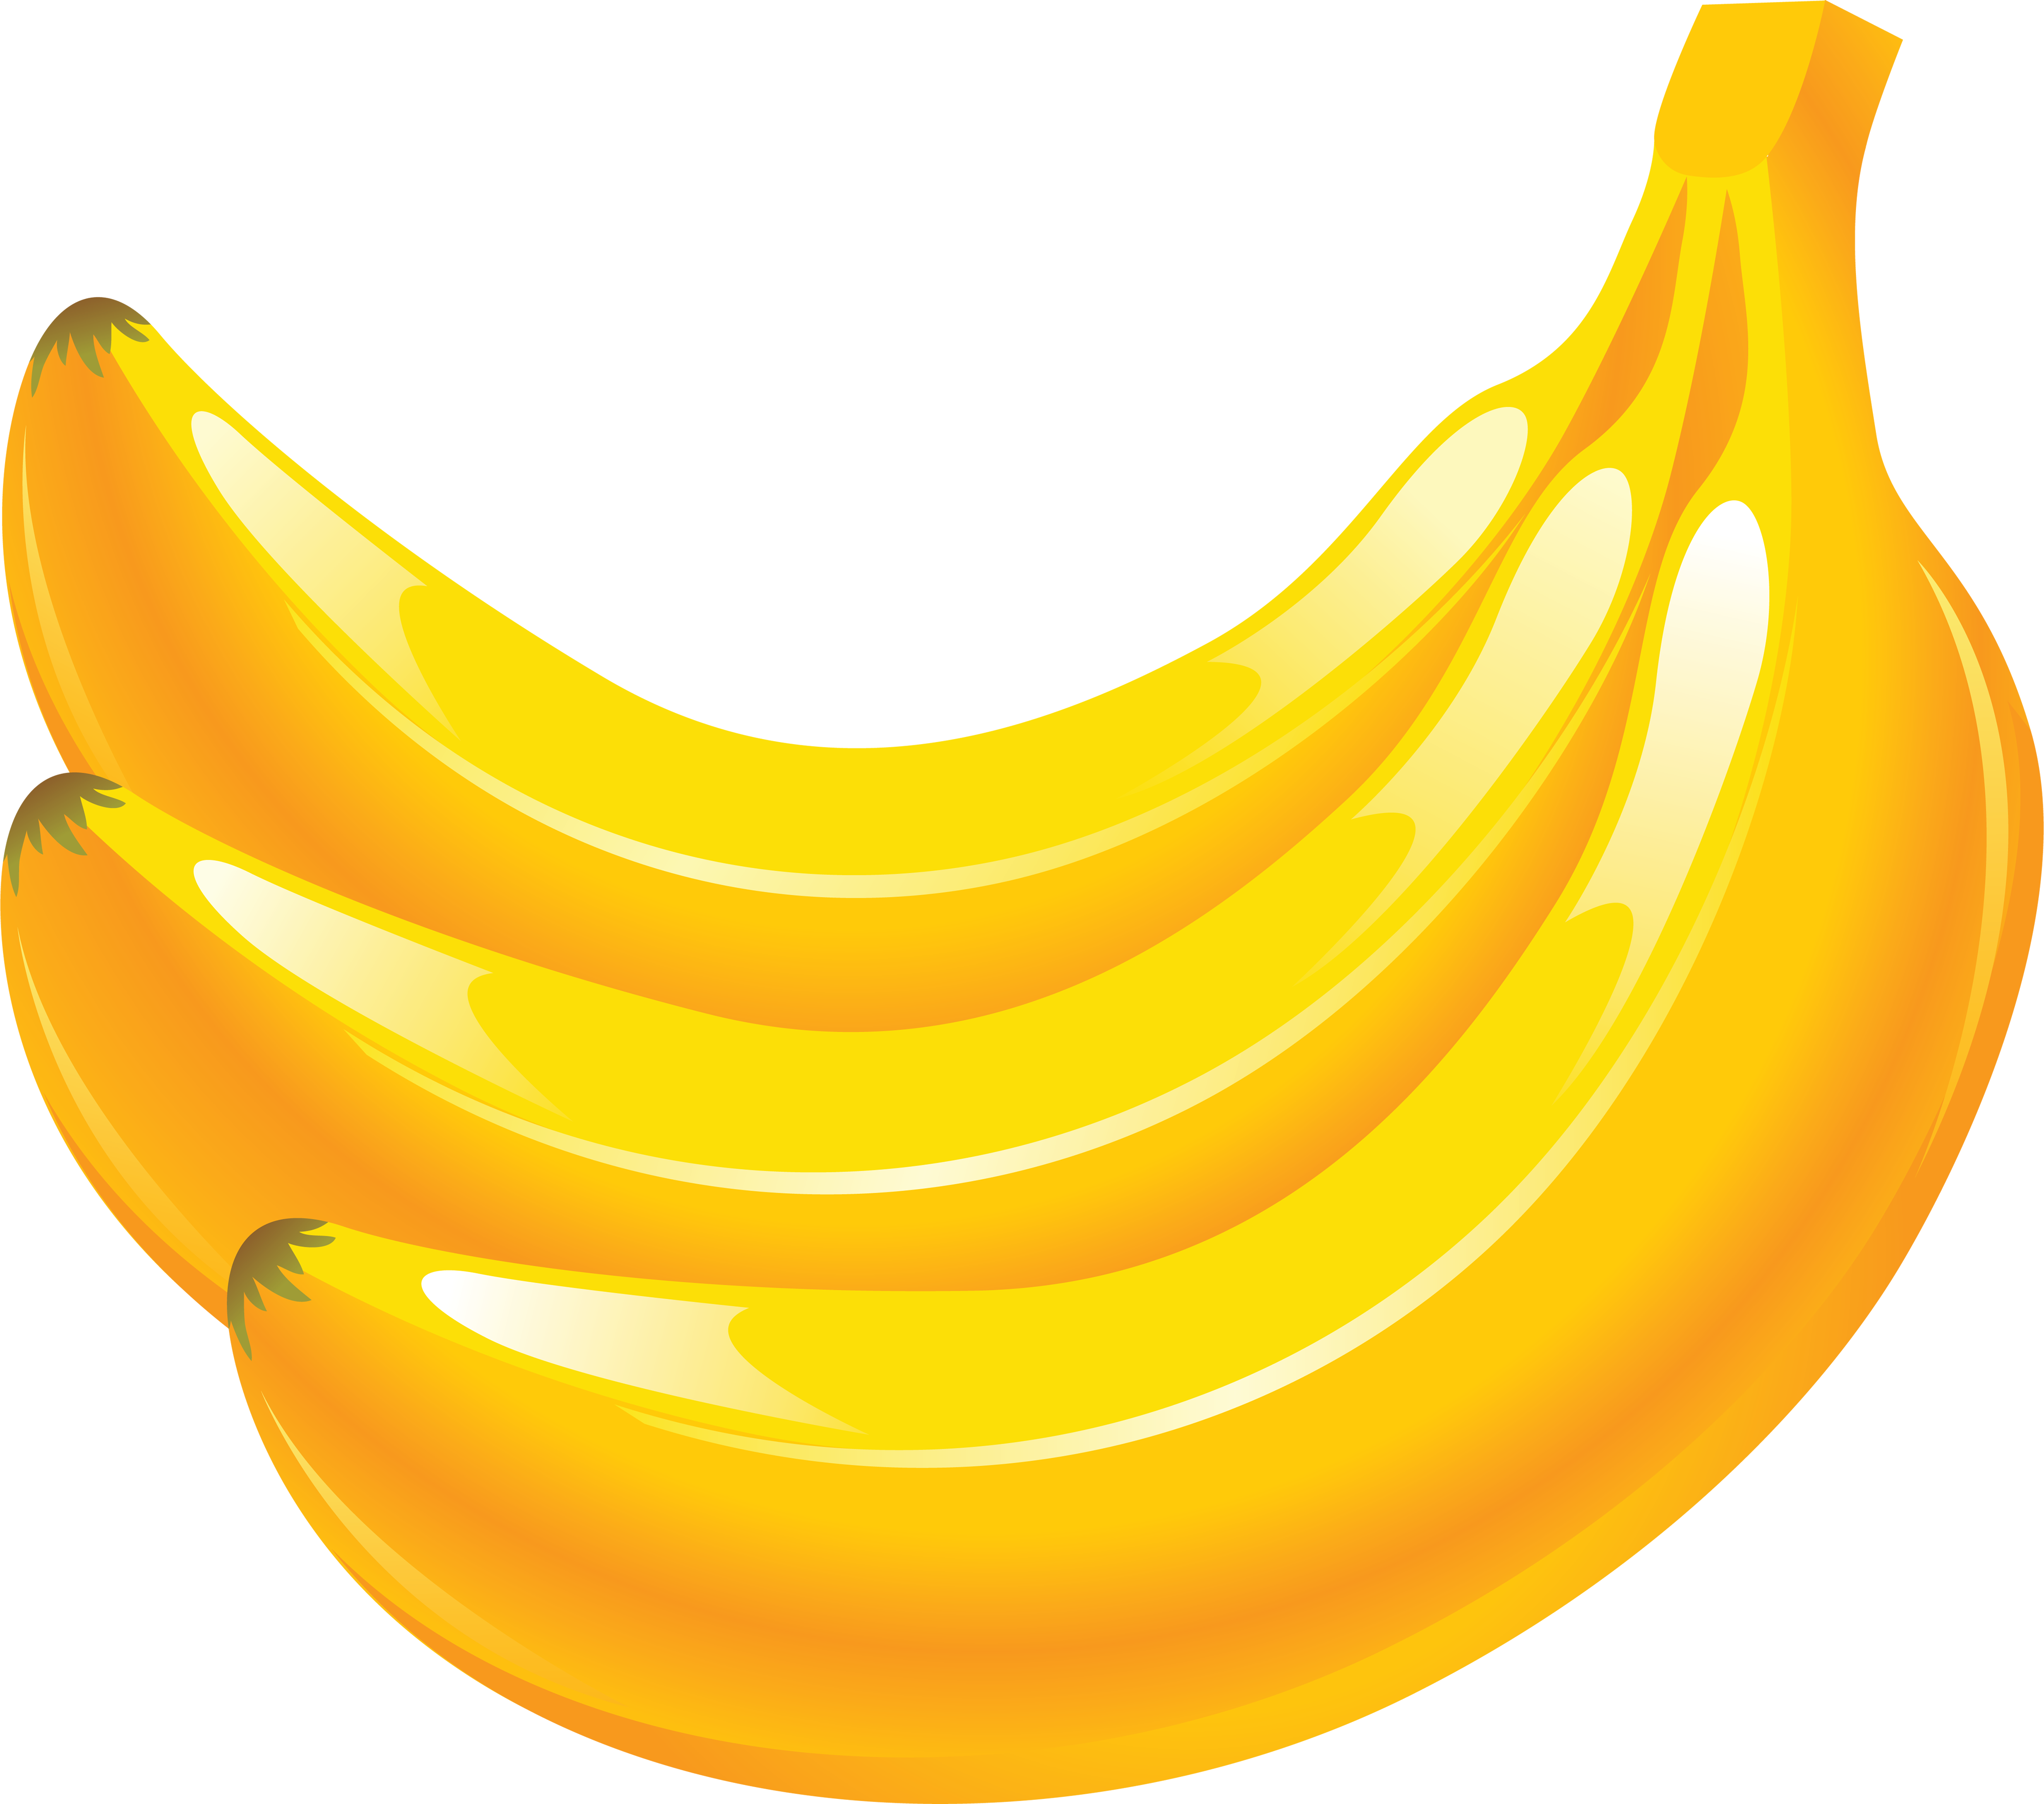 778739512ca3745061b6cc46c0e8491a Banana Png Image Free Picture Banana Clipart Hd 3989 3520 Png 3989 3520 Pisang